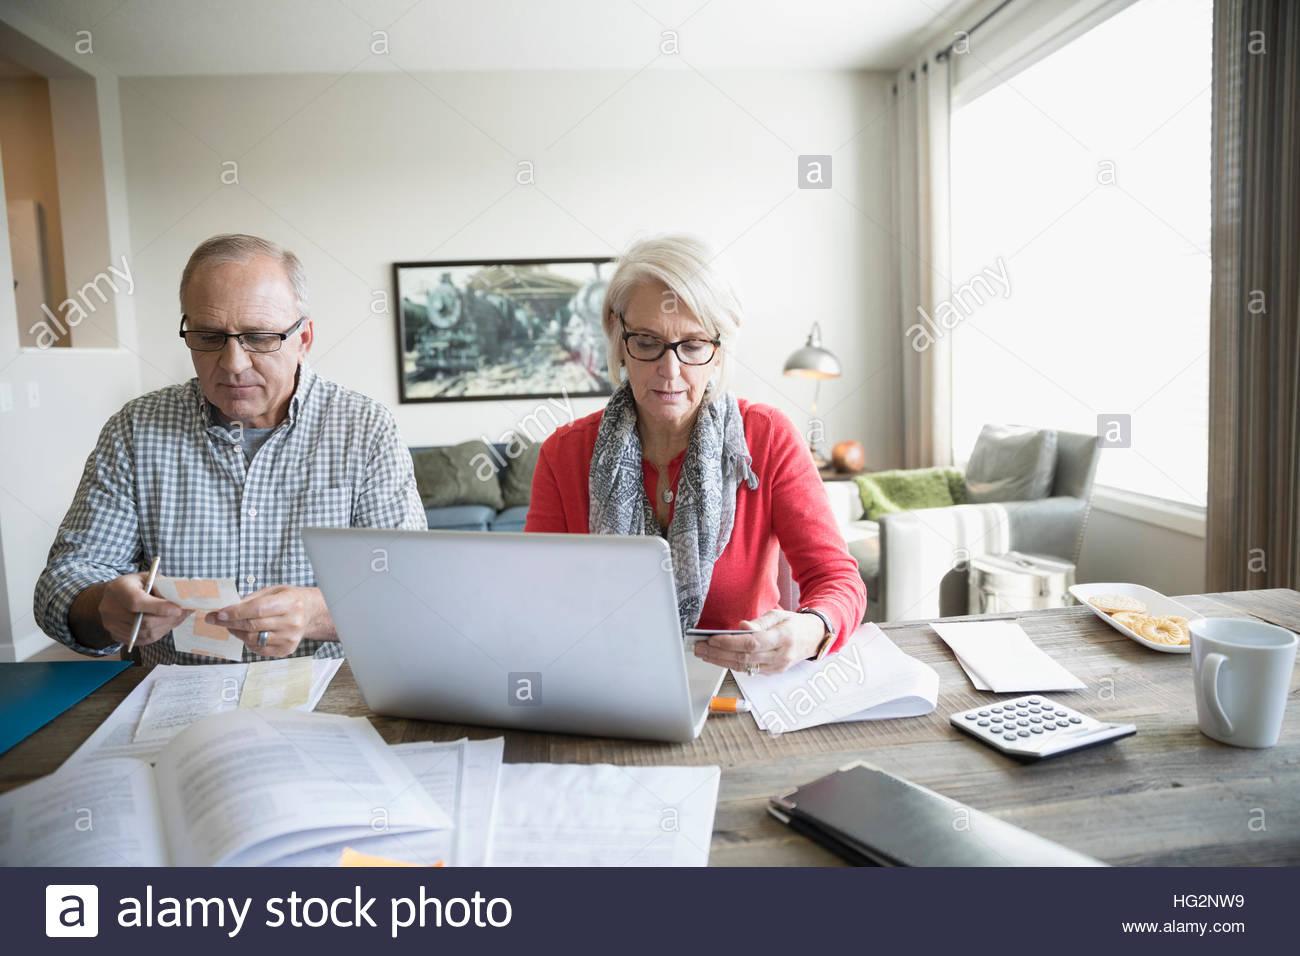 Canada Albanian Senior Singles Dating Online Service